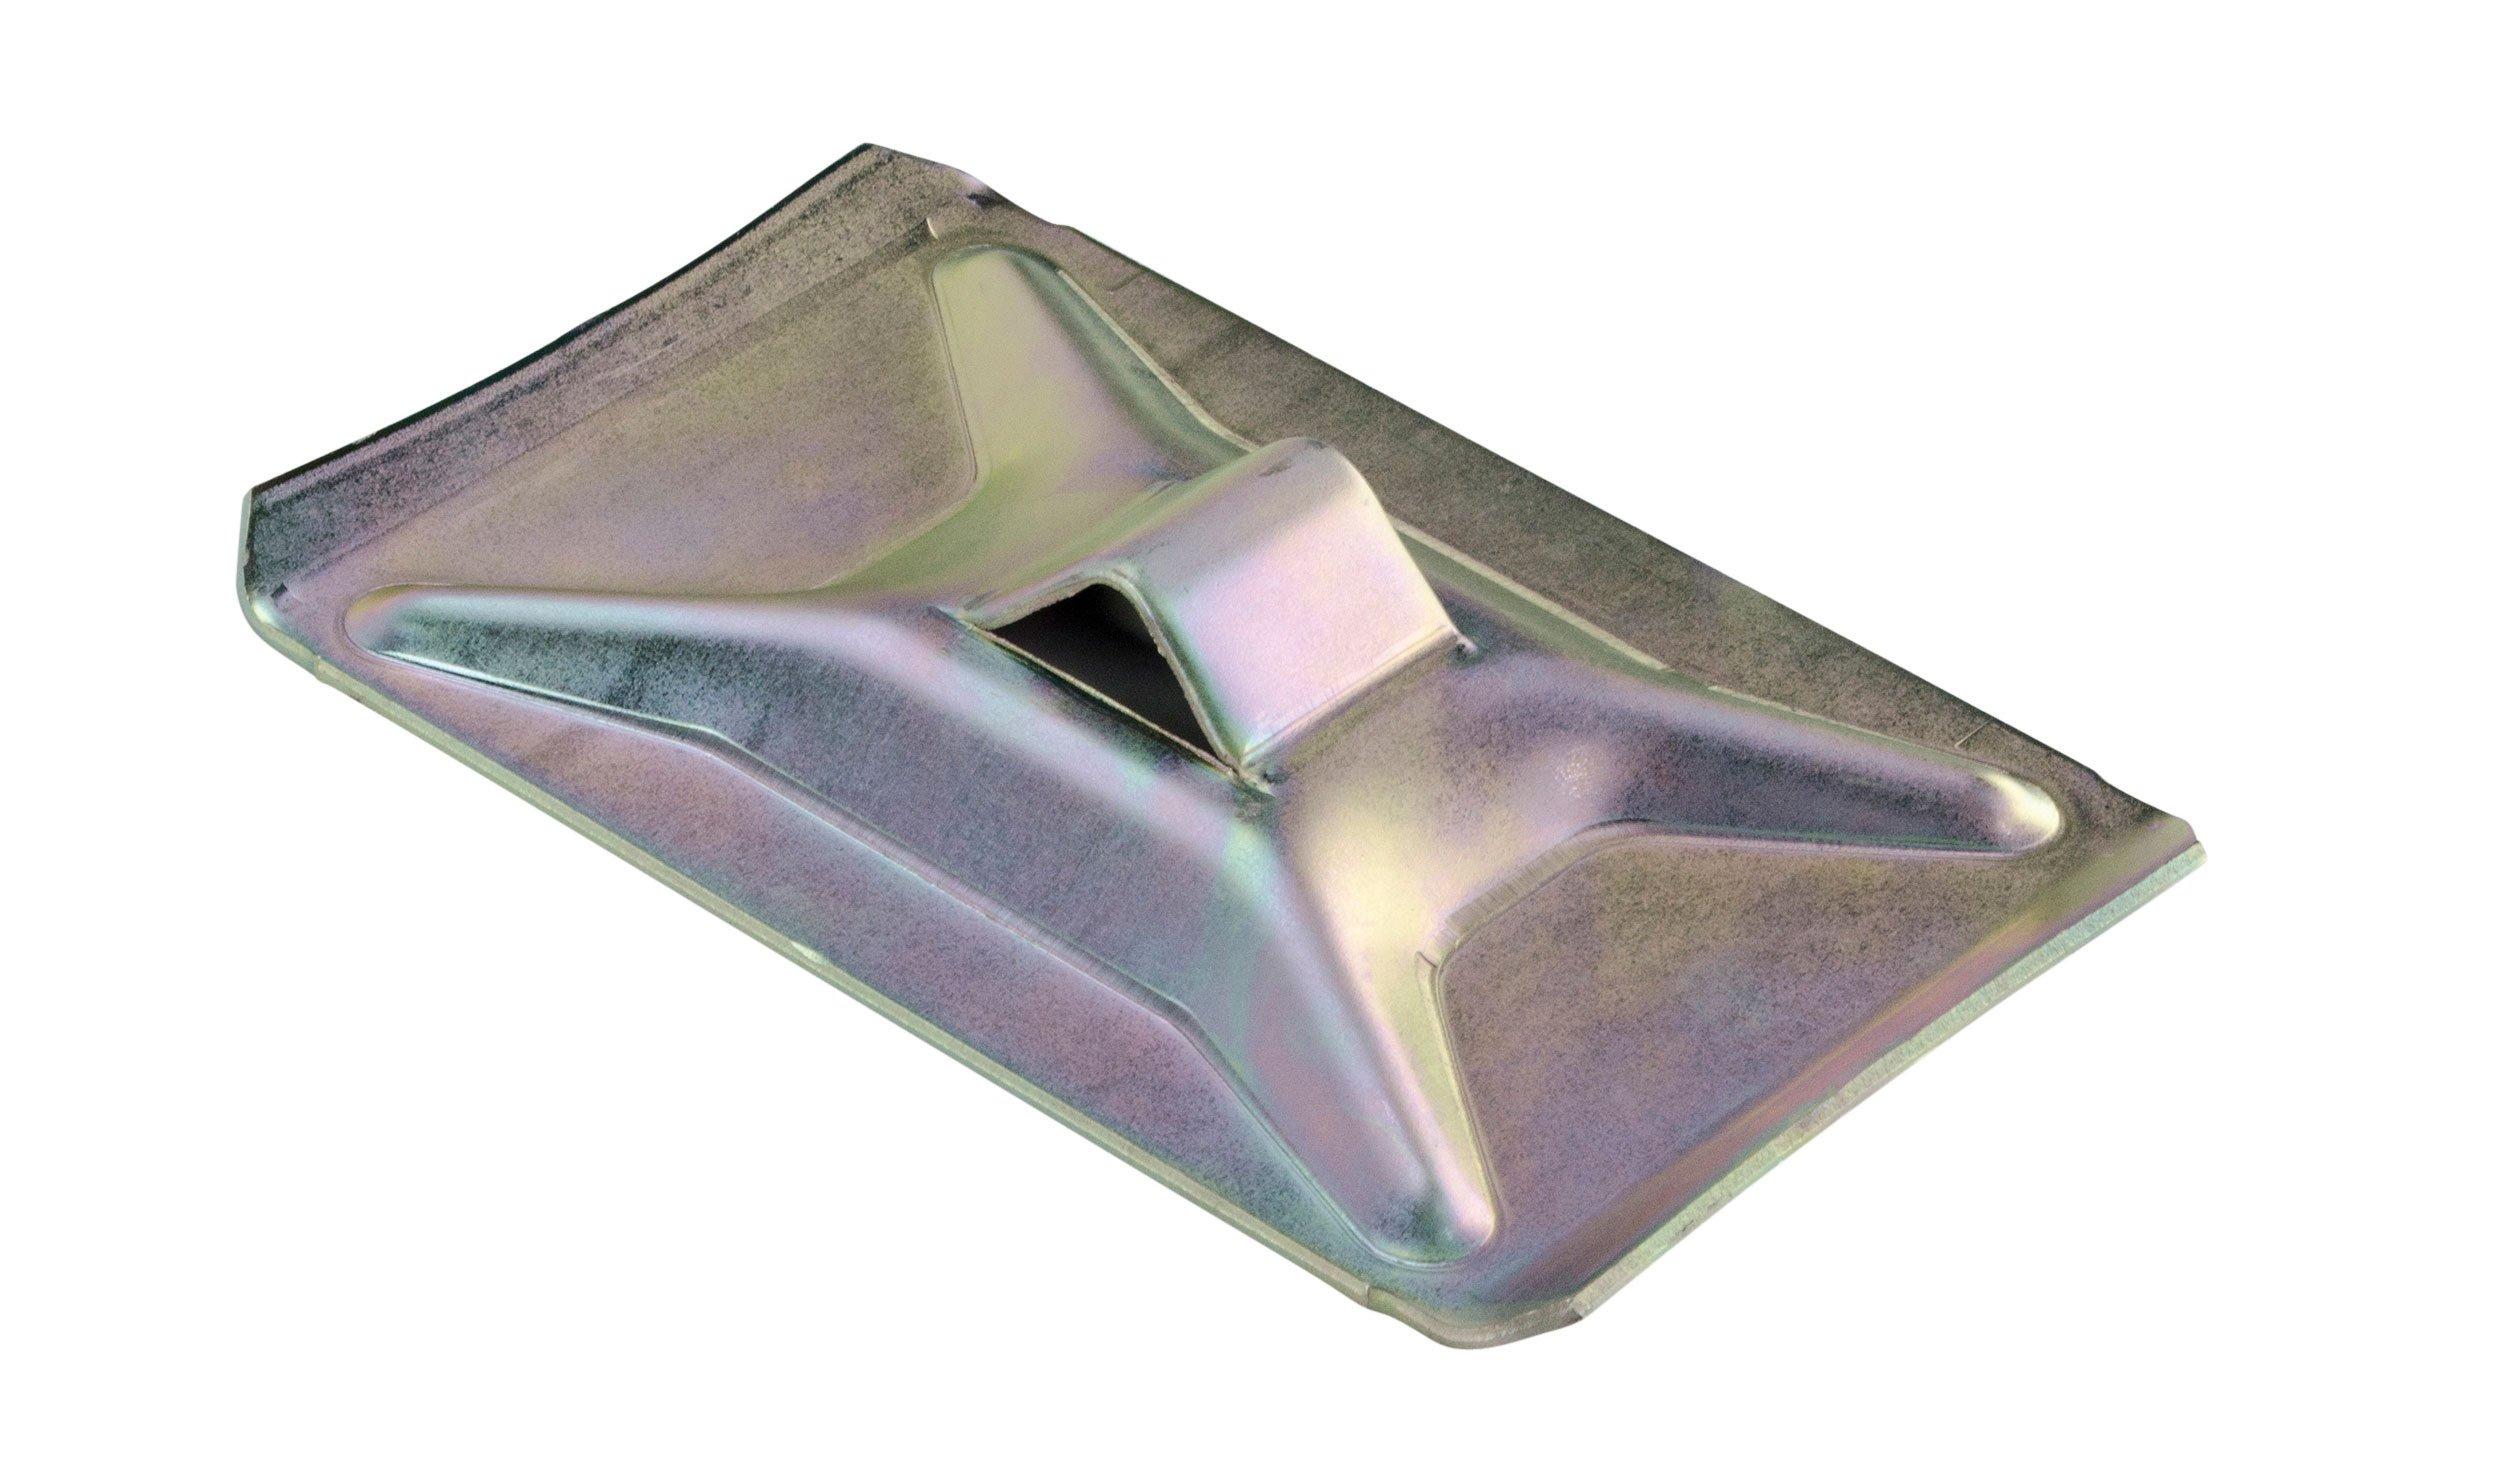 Lippert 119225 Standard Foot Pad for Fifth Wheel Landing Gear by Lippert Components